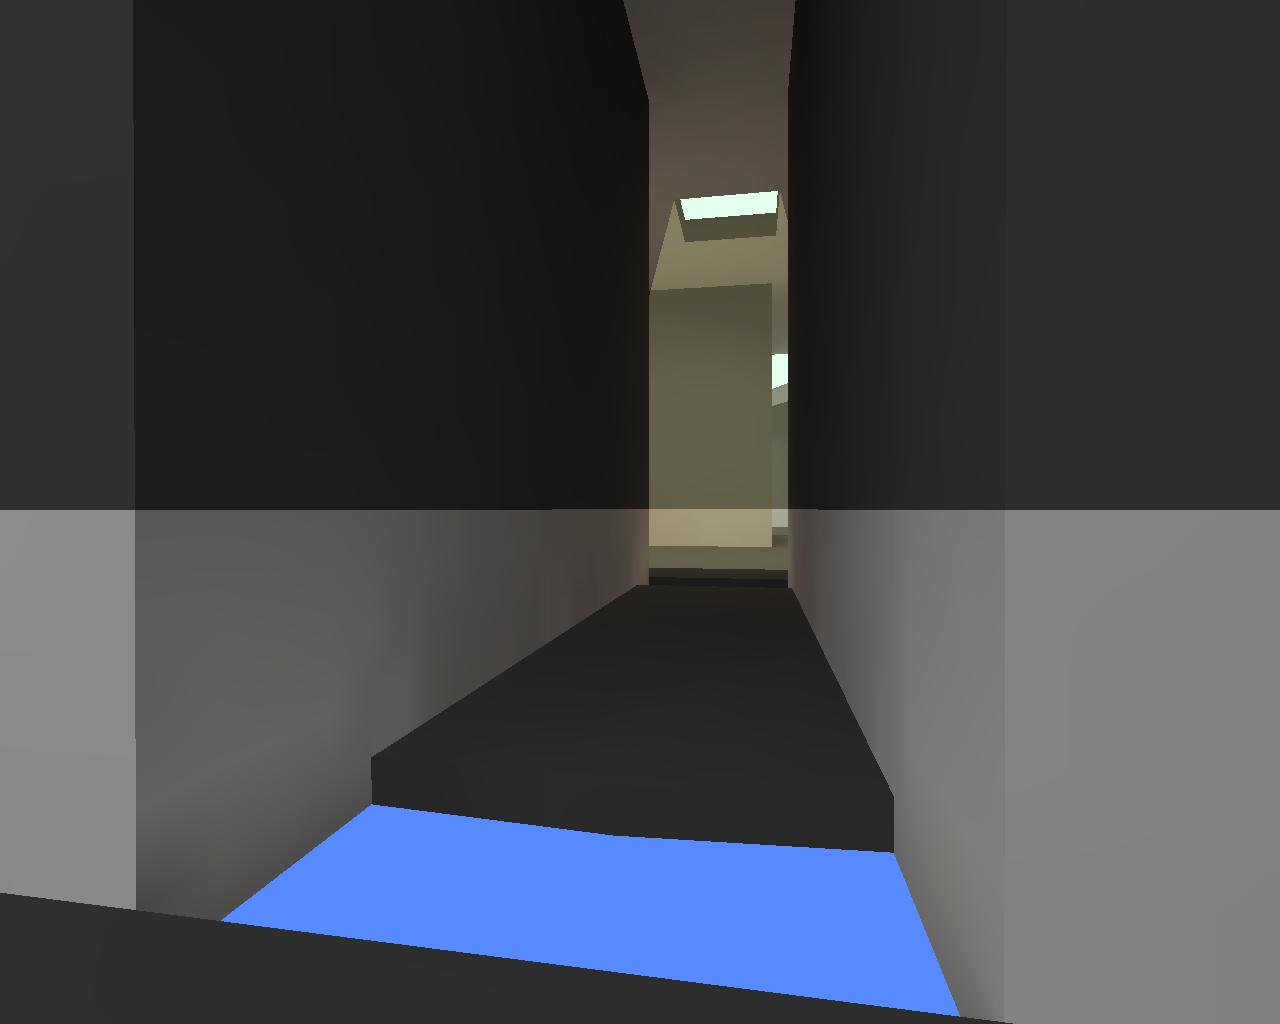 minimalism0002.png - Half-Life